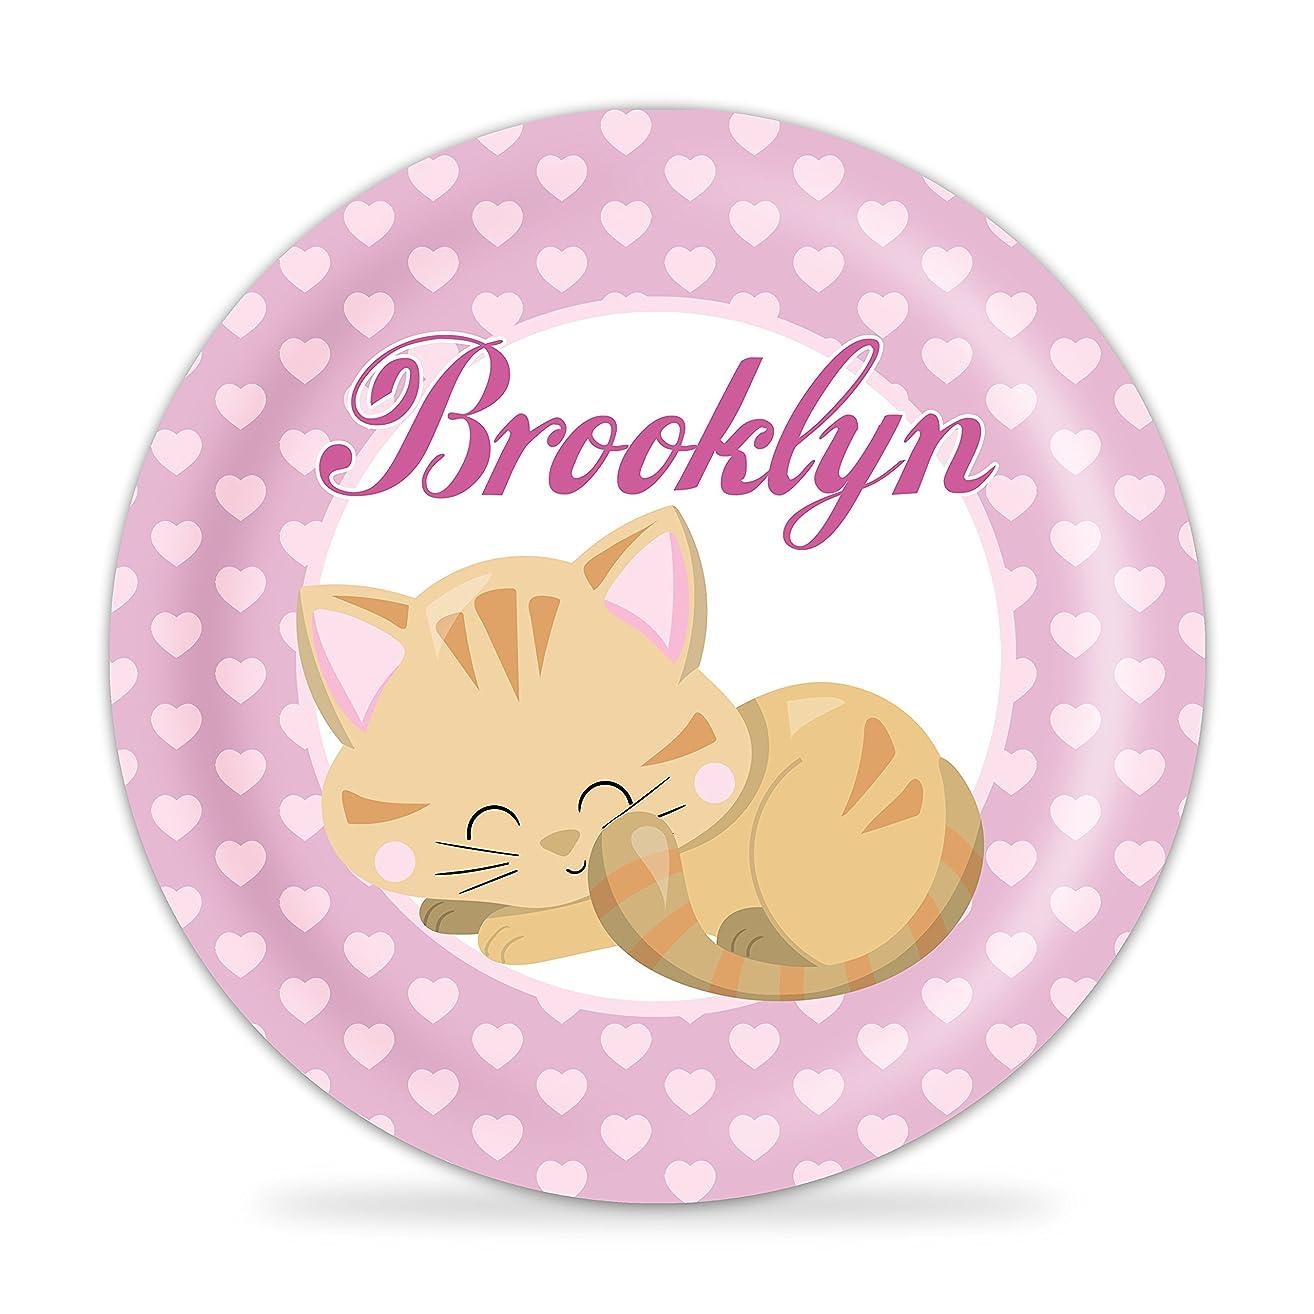 Kitten Plate - Pink Heart, Cat Melamine Personalized Plate